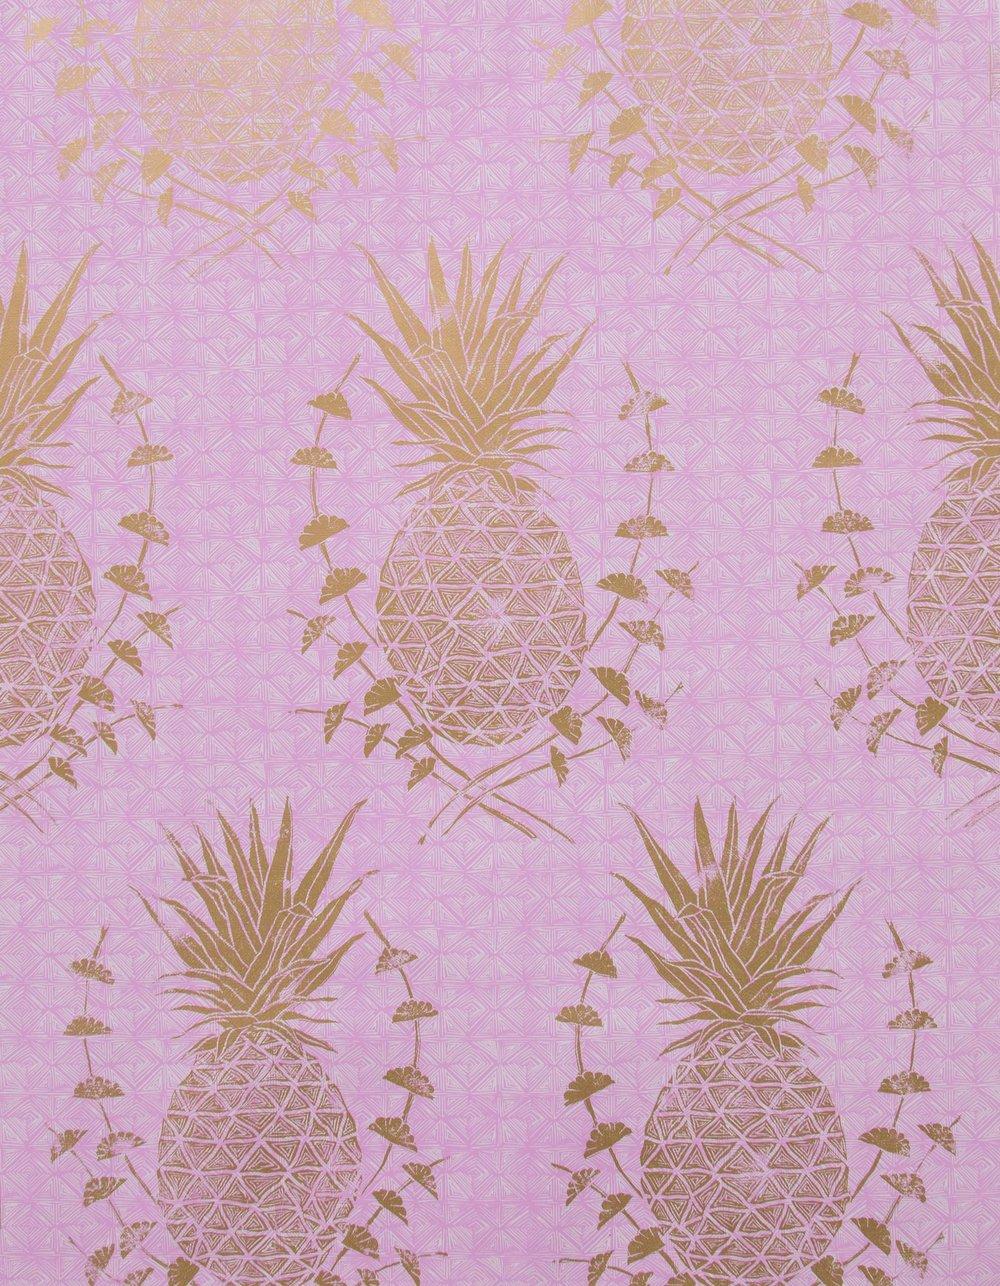 Krane Home_Royal Pineapple Pink Wallpaper-1.jpeg